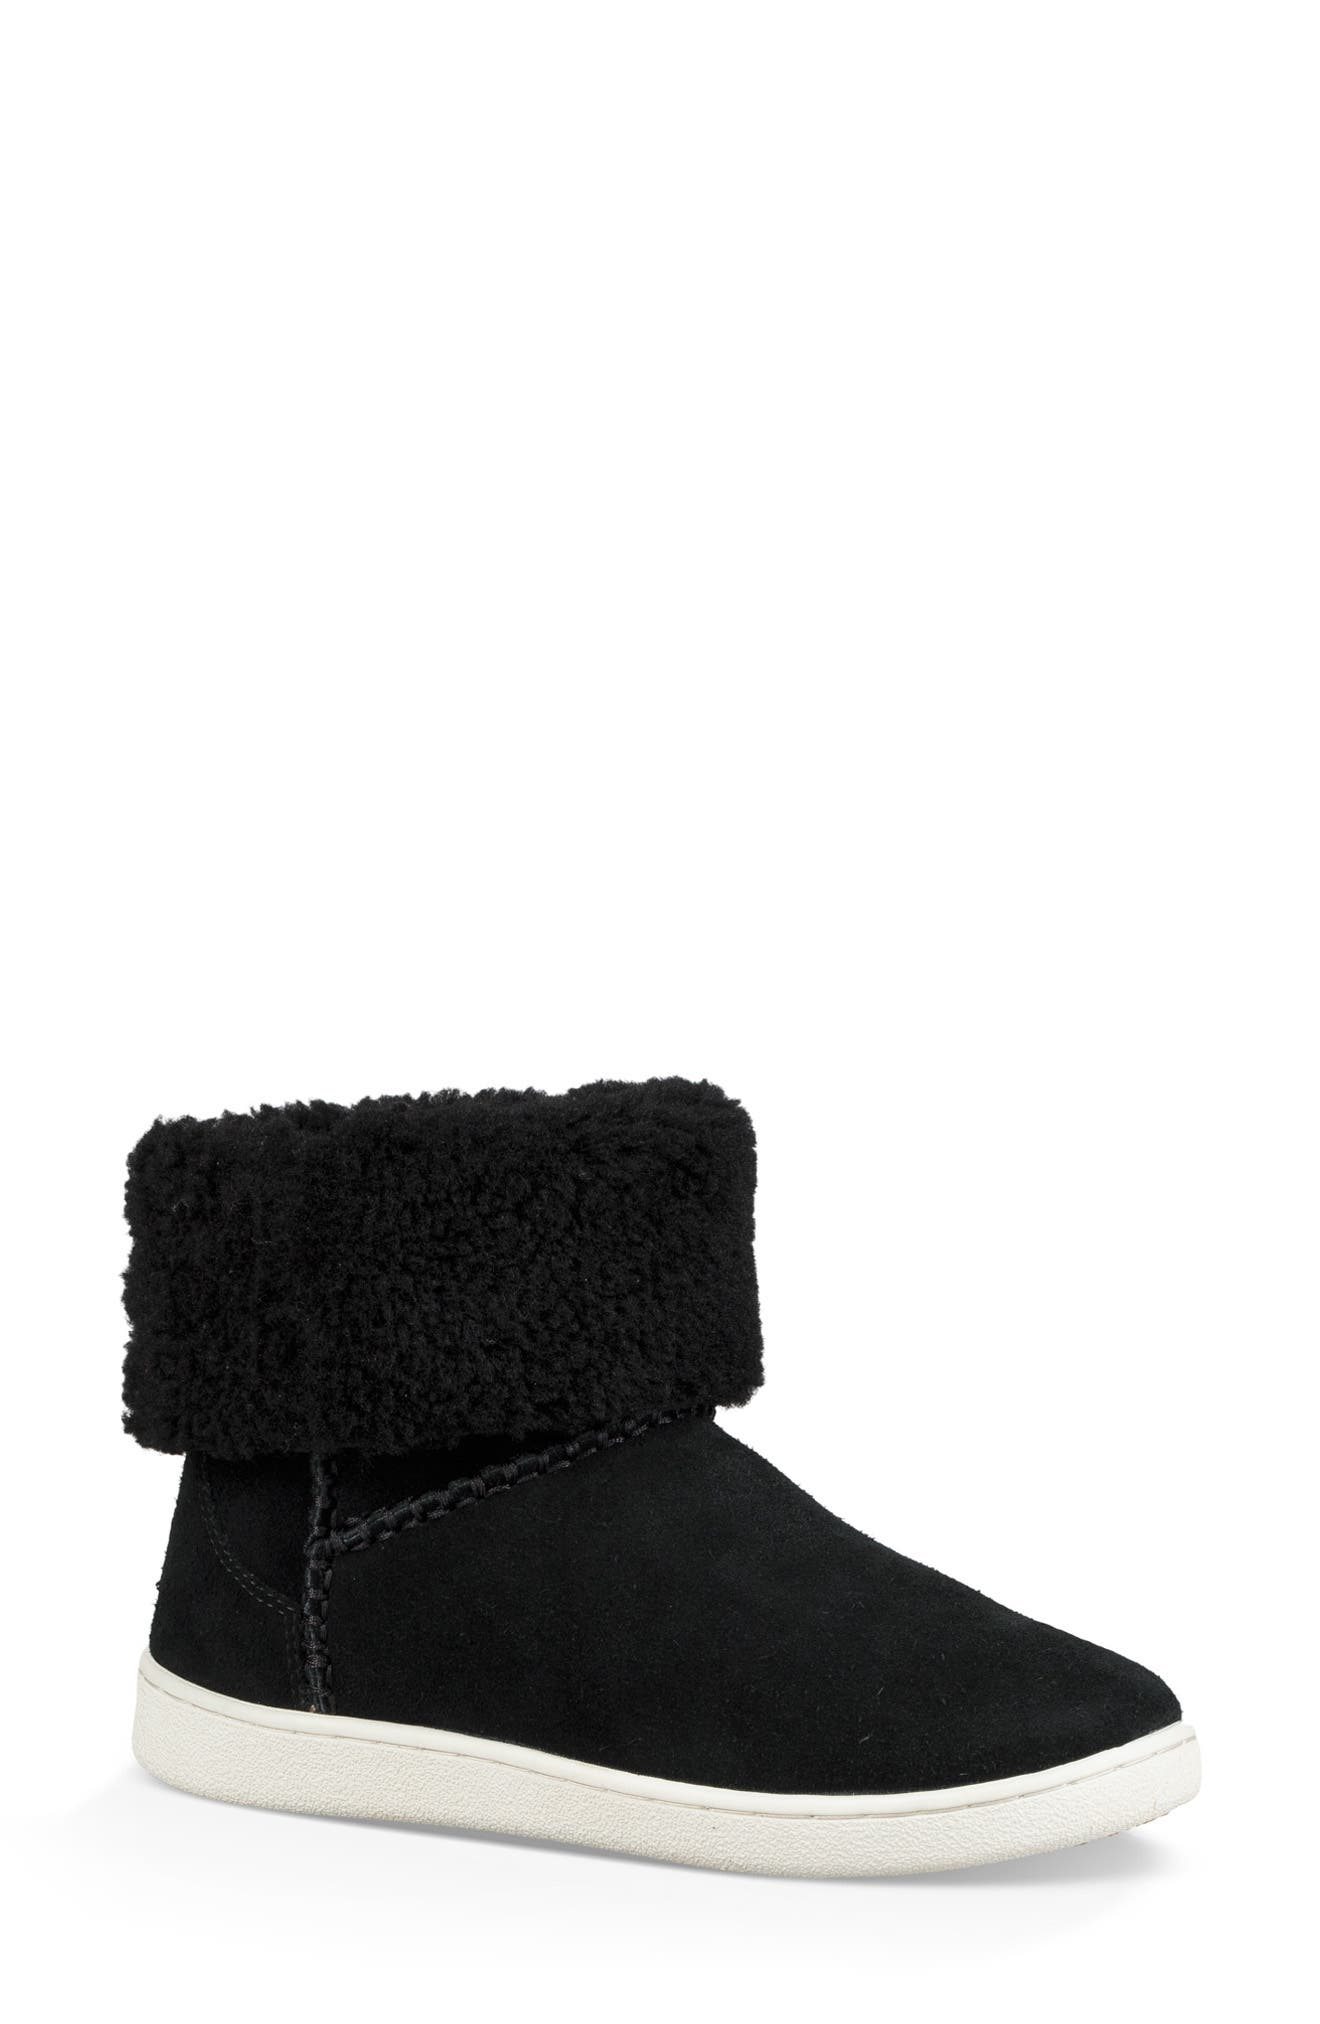 Mika Classic Genuine Shearling Sneaker,                             Main thumbnail 1, color,                             BLACK